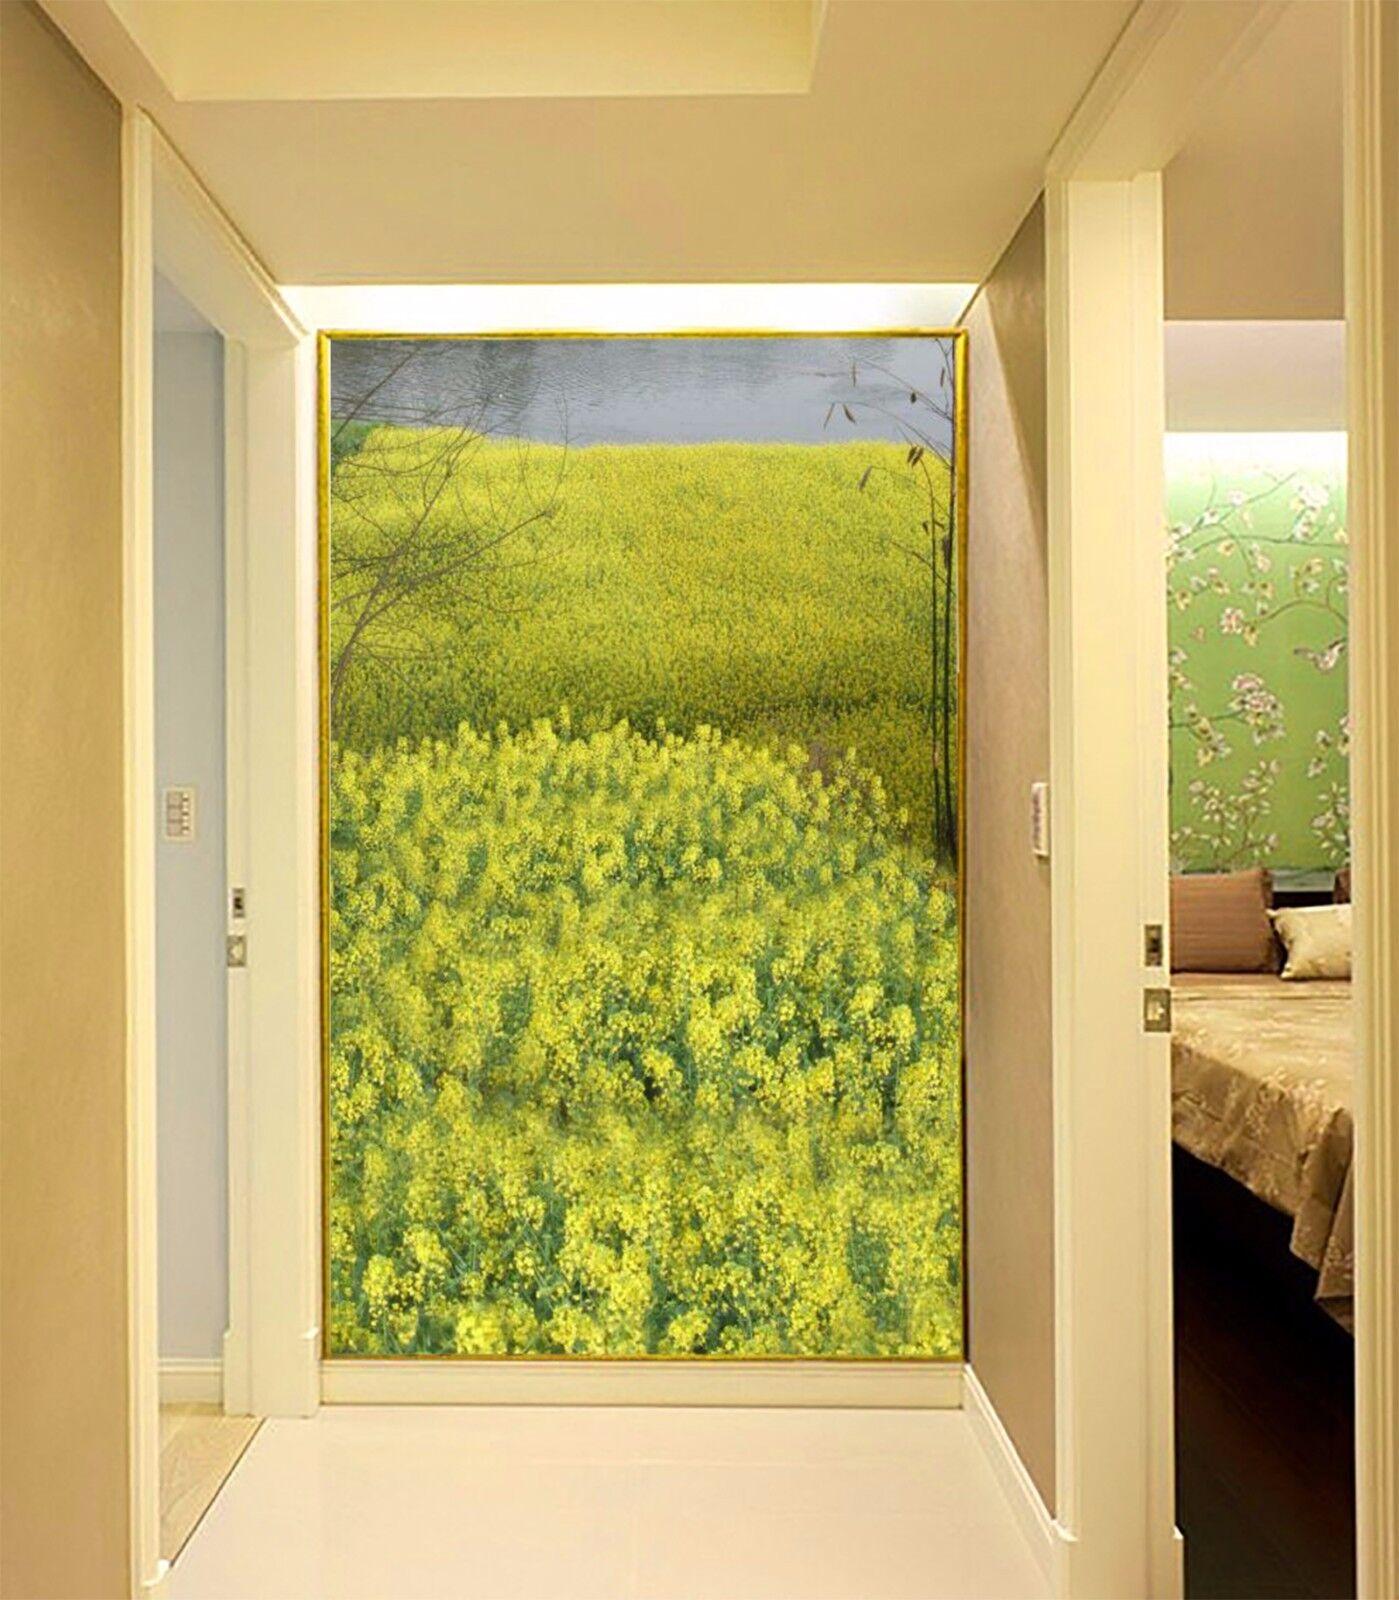 3D Gelb Rape 4 Wallpaper Murals Wall Print Wallpaper Mural AJ WALL AU Lemon